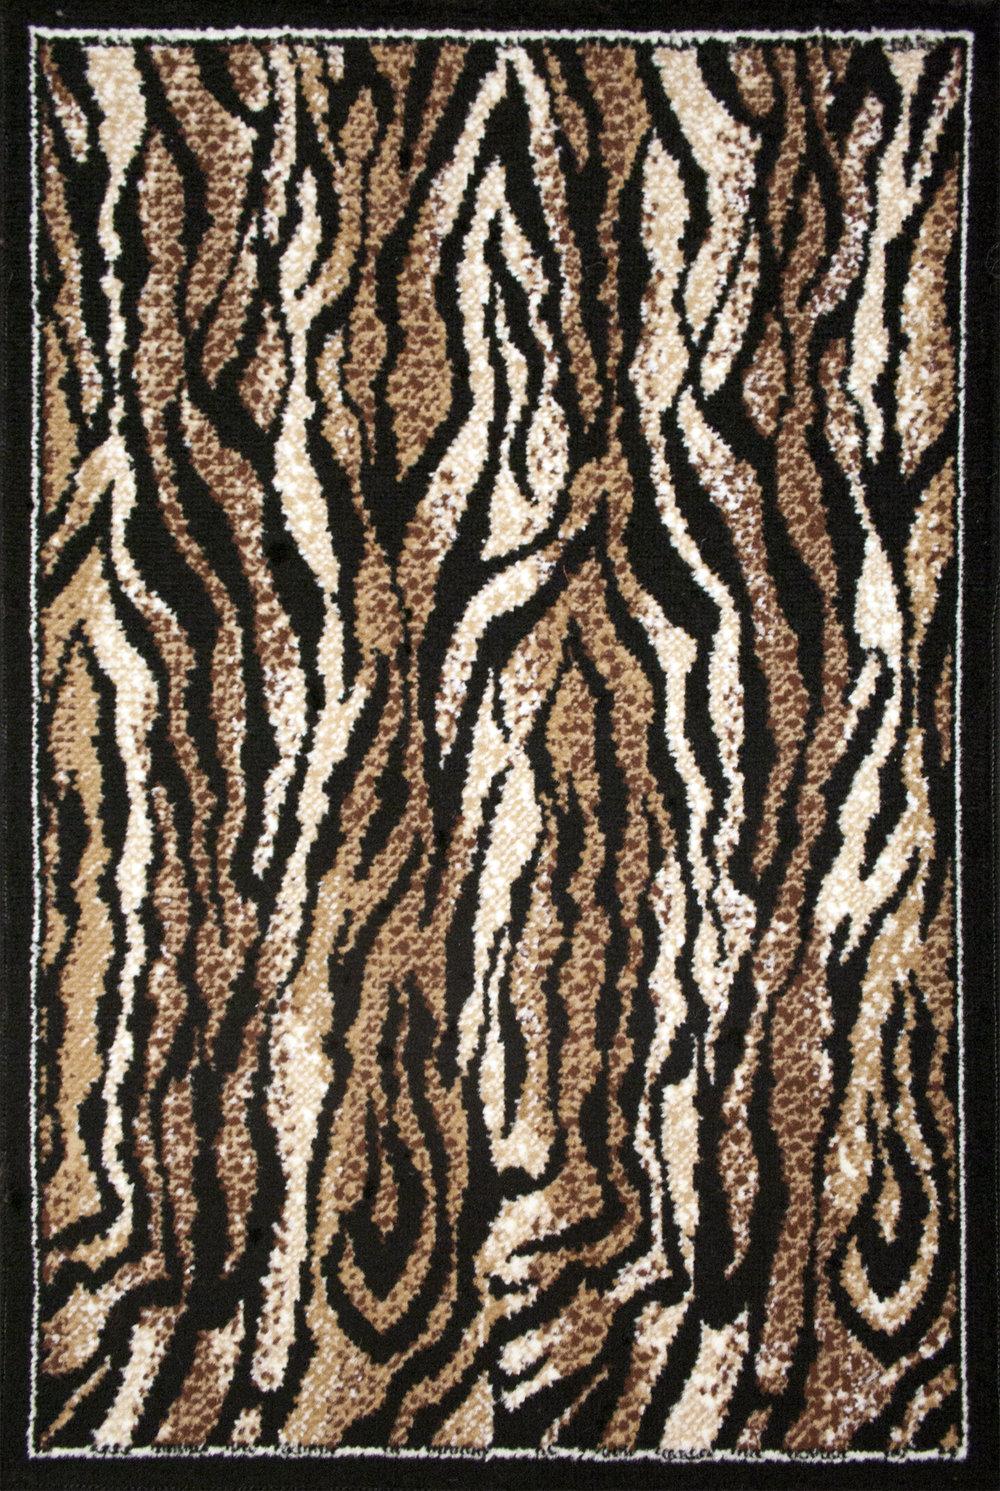 Tiger Skin Rug.jpg